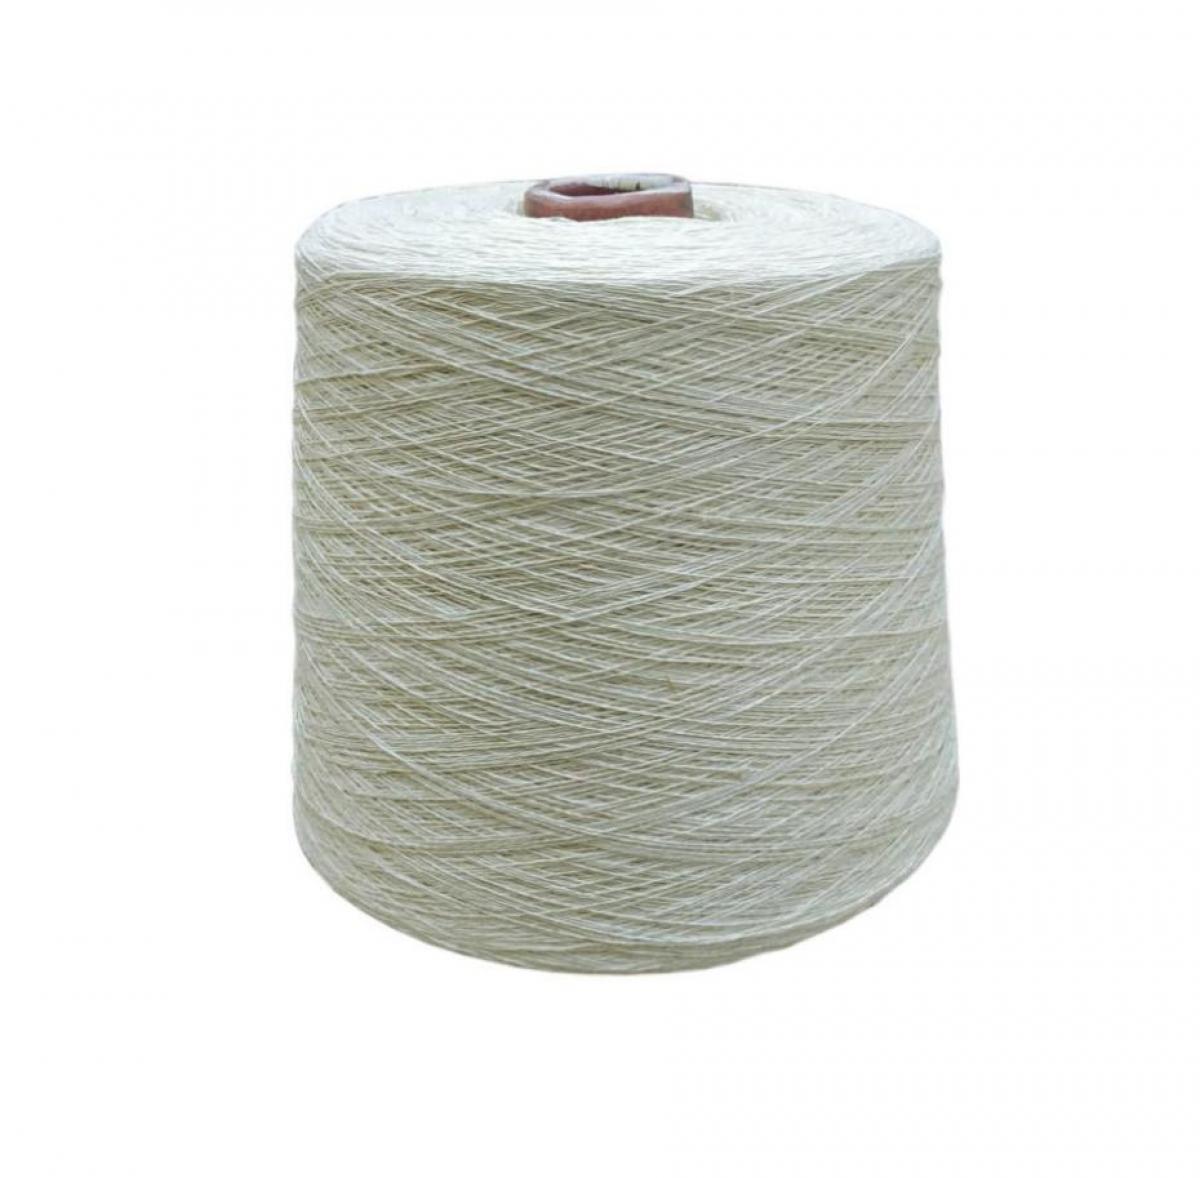 Linen yarn Nm 12,5/2